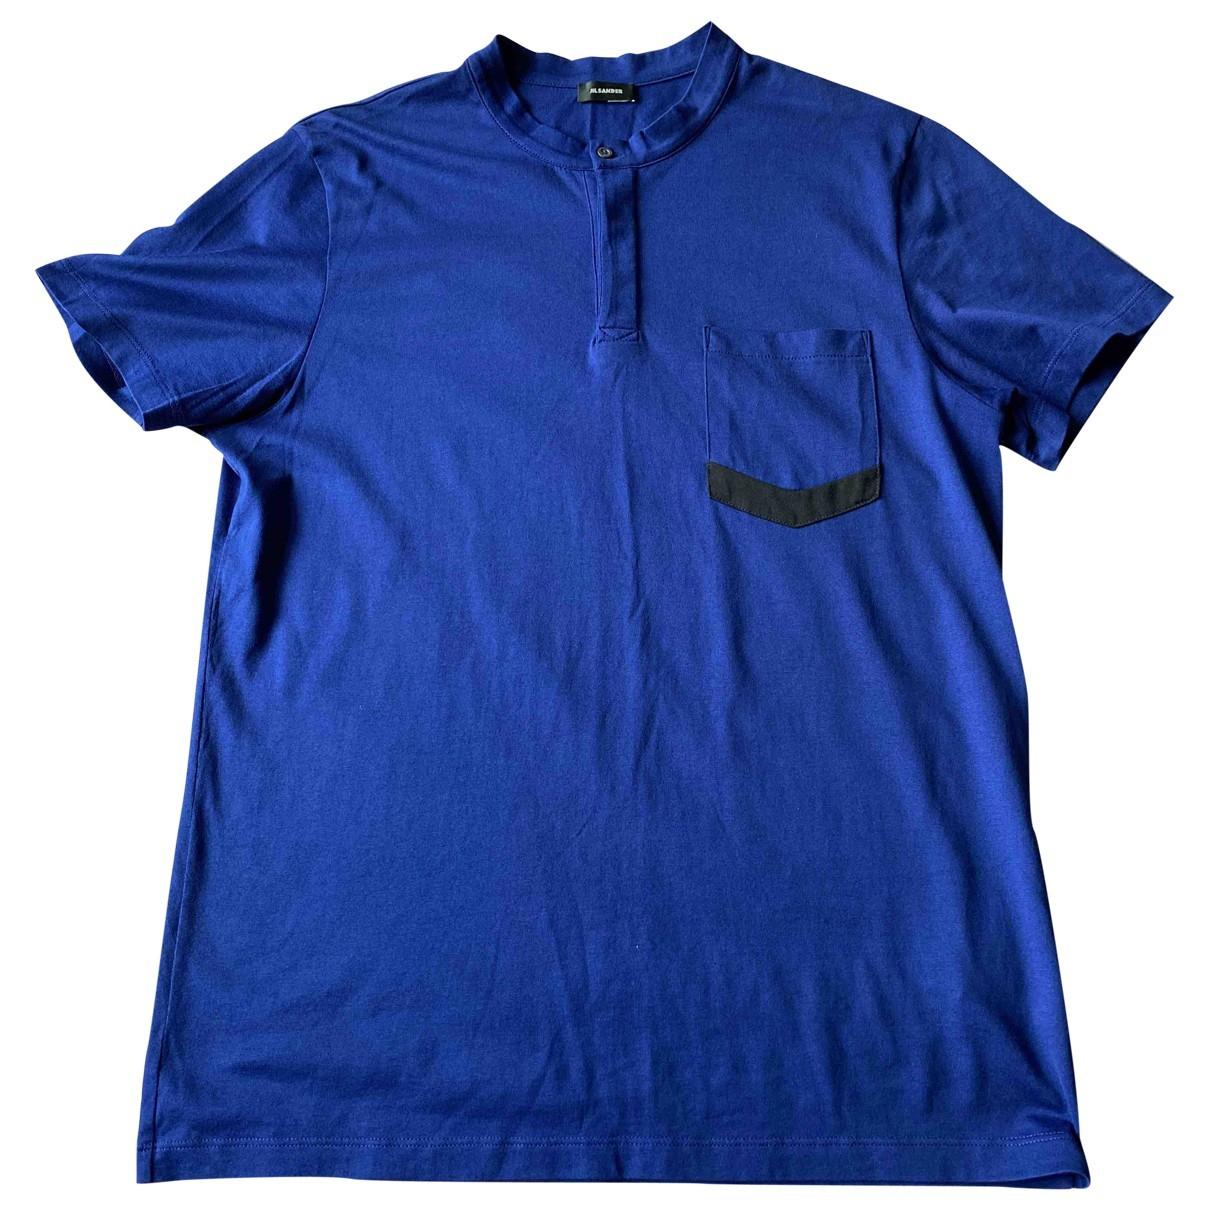 Jil Sander - Tee shirts   pour homme en coton - bleu